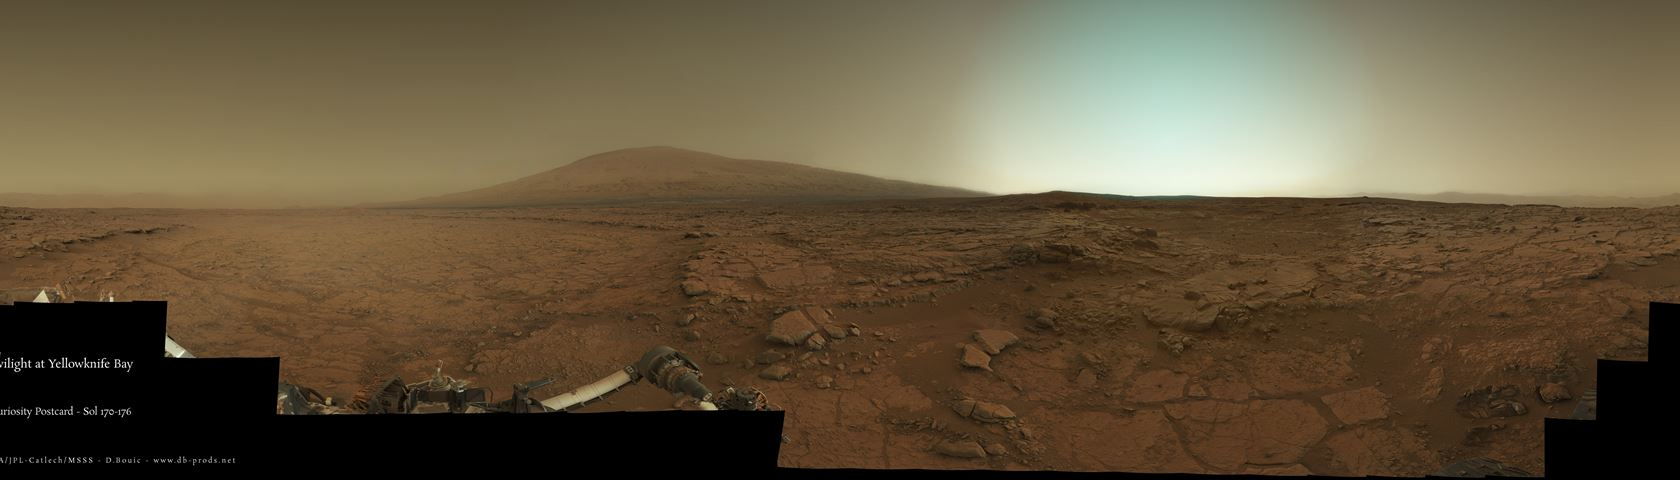 Mars landscape taken by Curiosity Rover